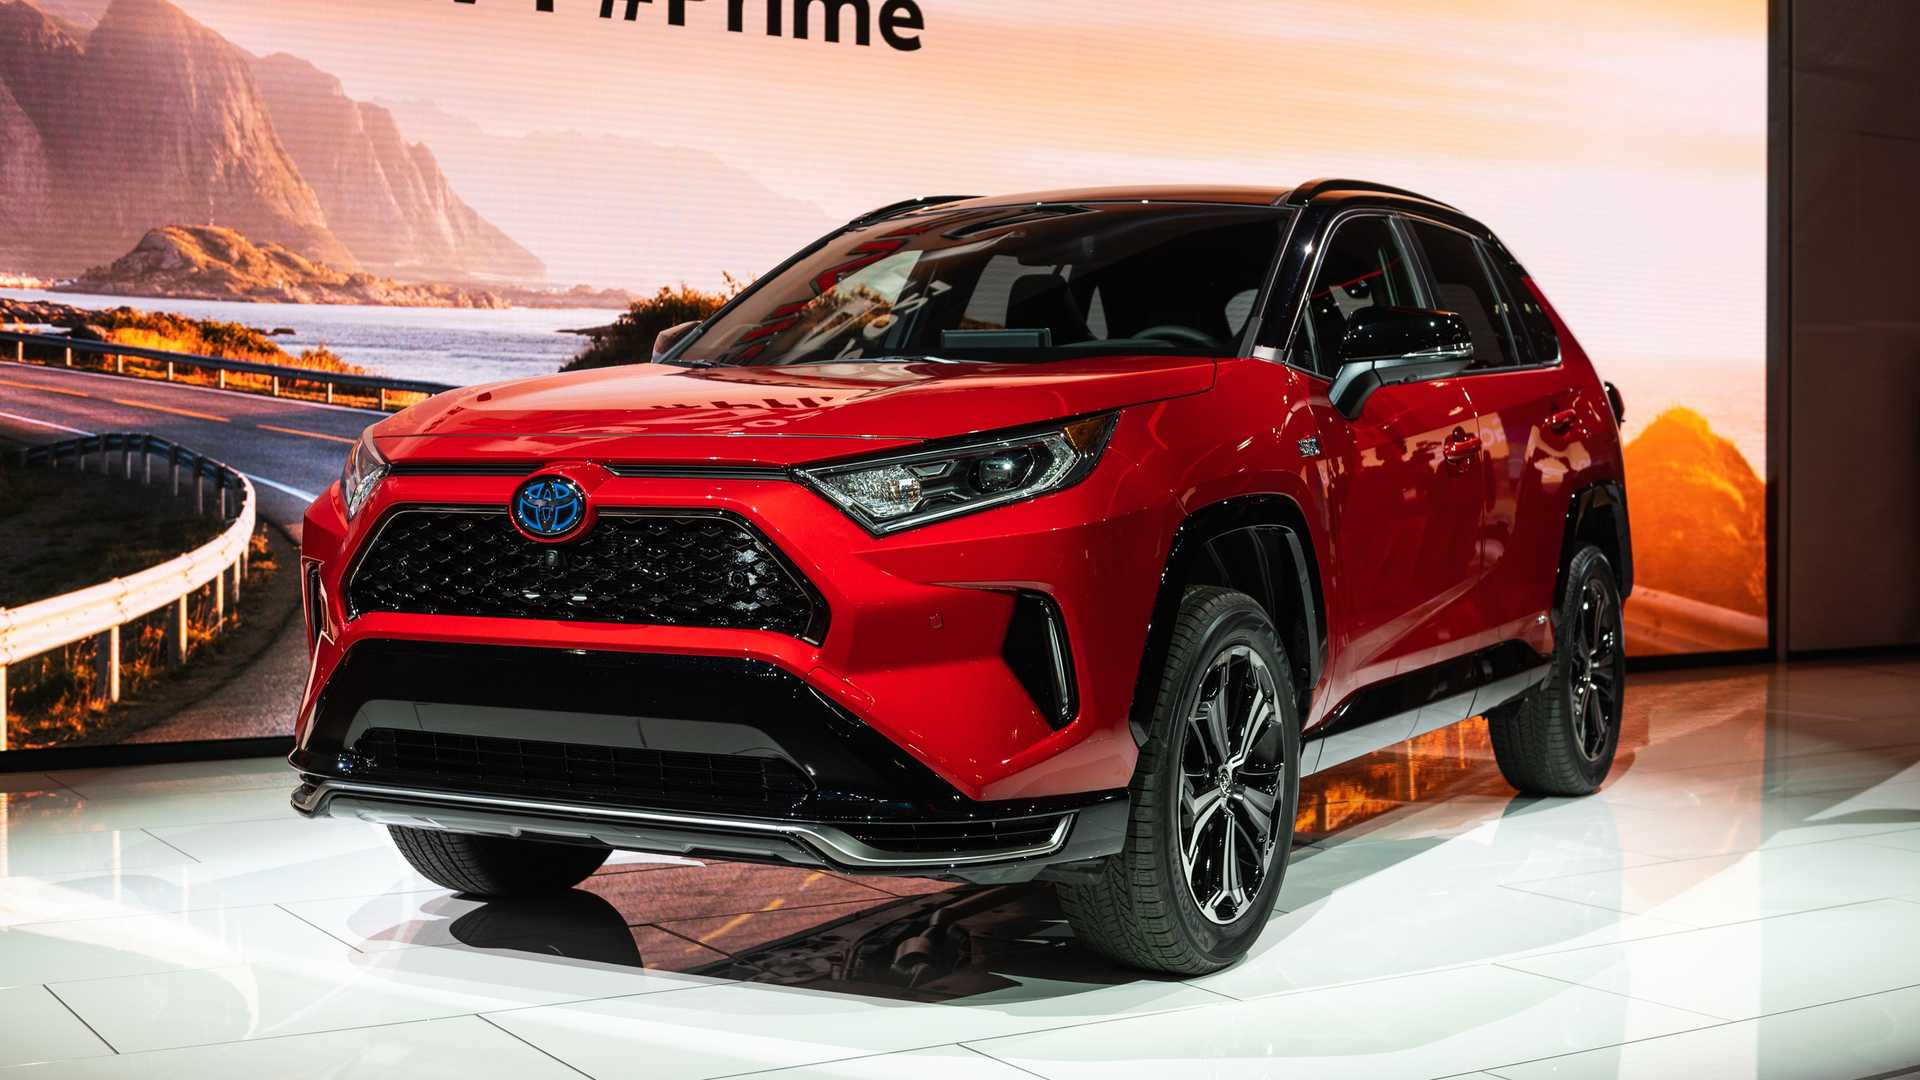 2021 Toyota RAV4 Prime Price Announced, Starts At $38,100